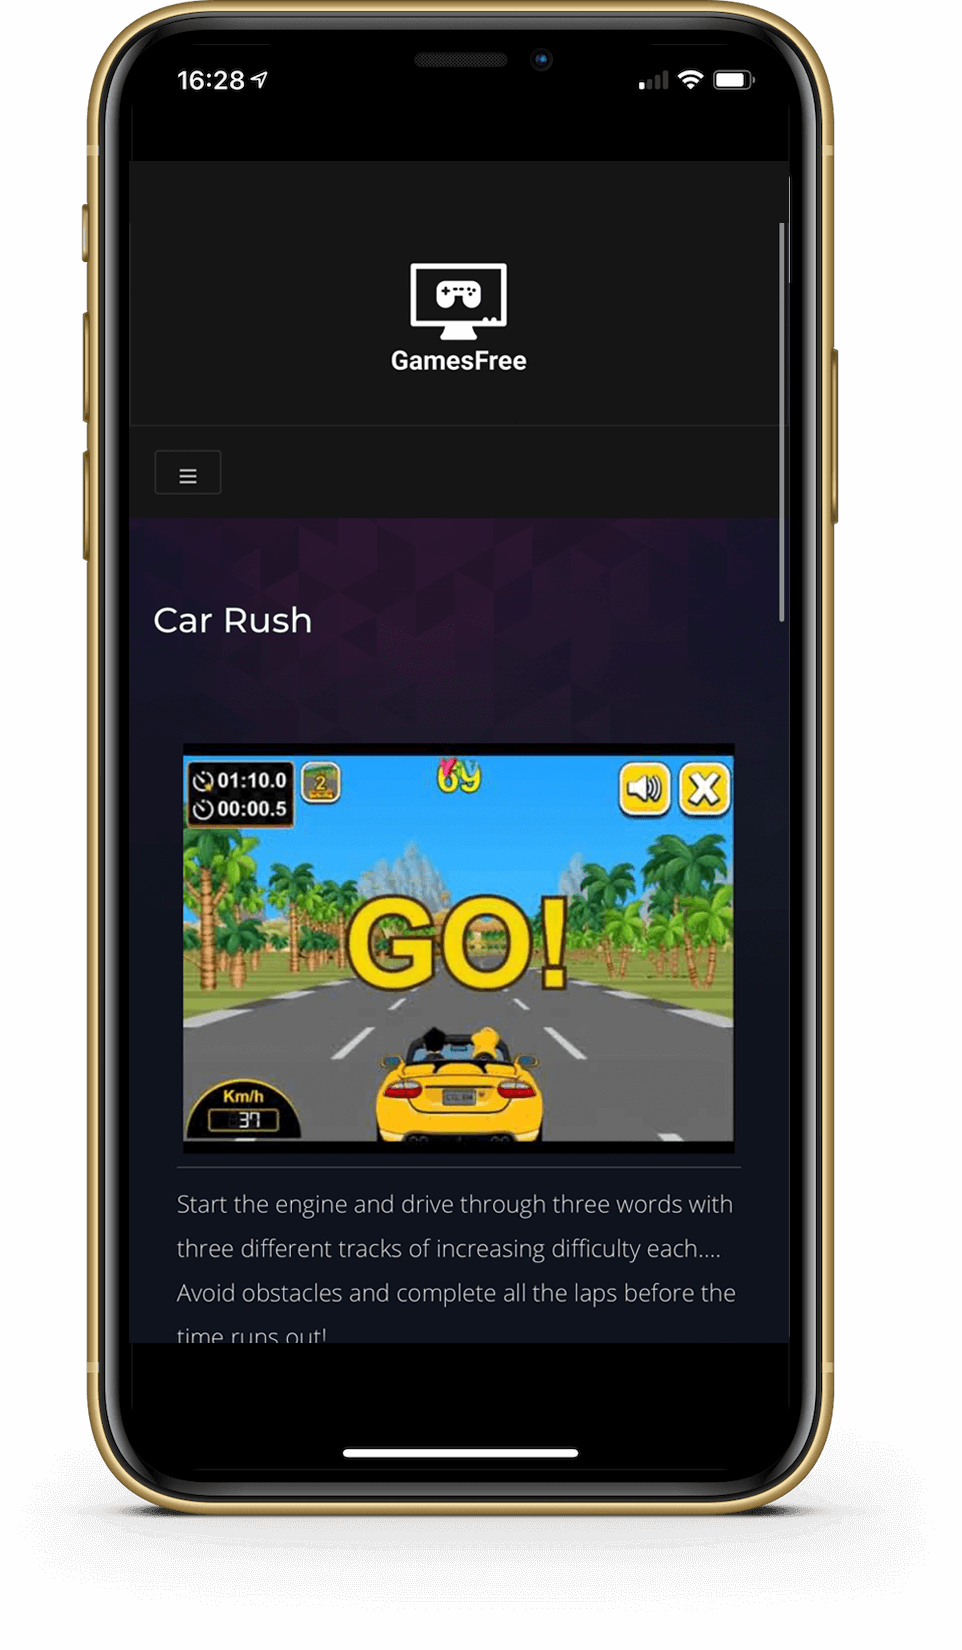 Gamesfree screenshot